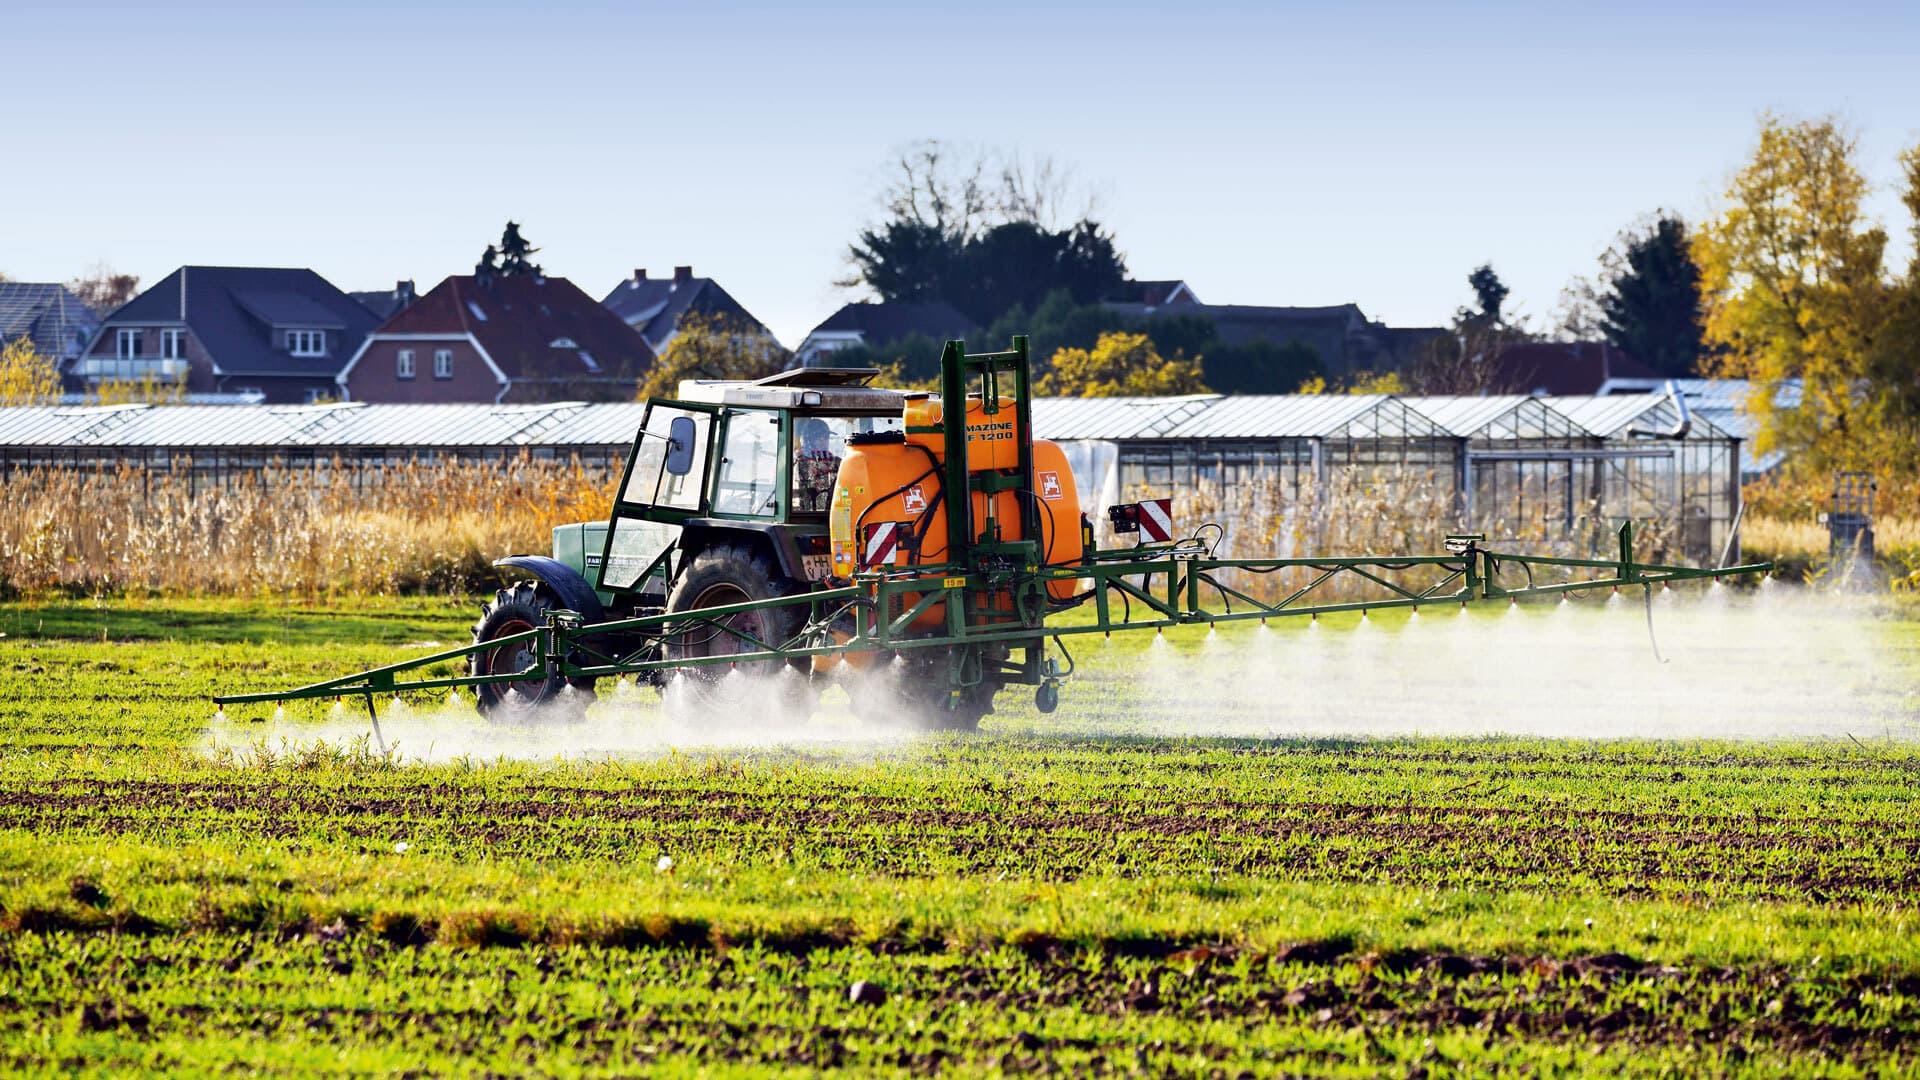 Traktor sprüht Pestizide auf ein Feld